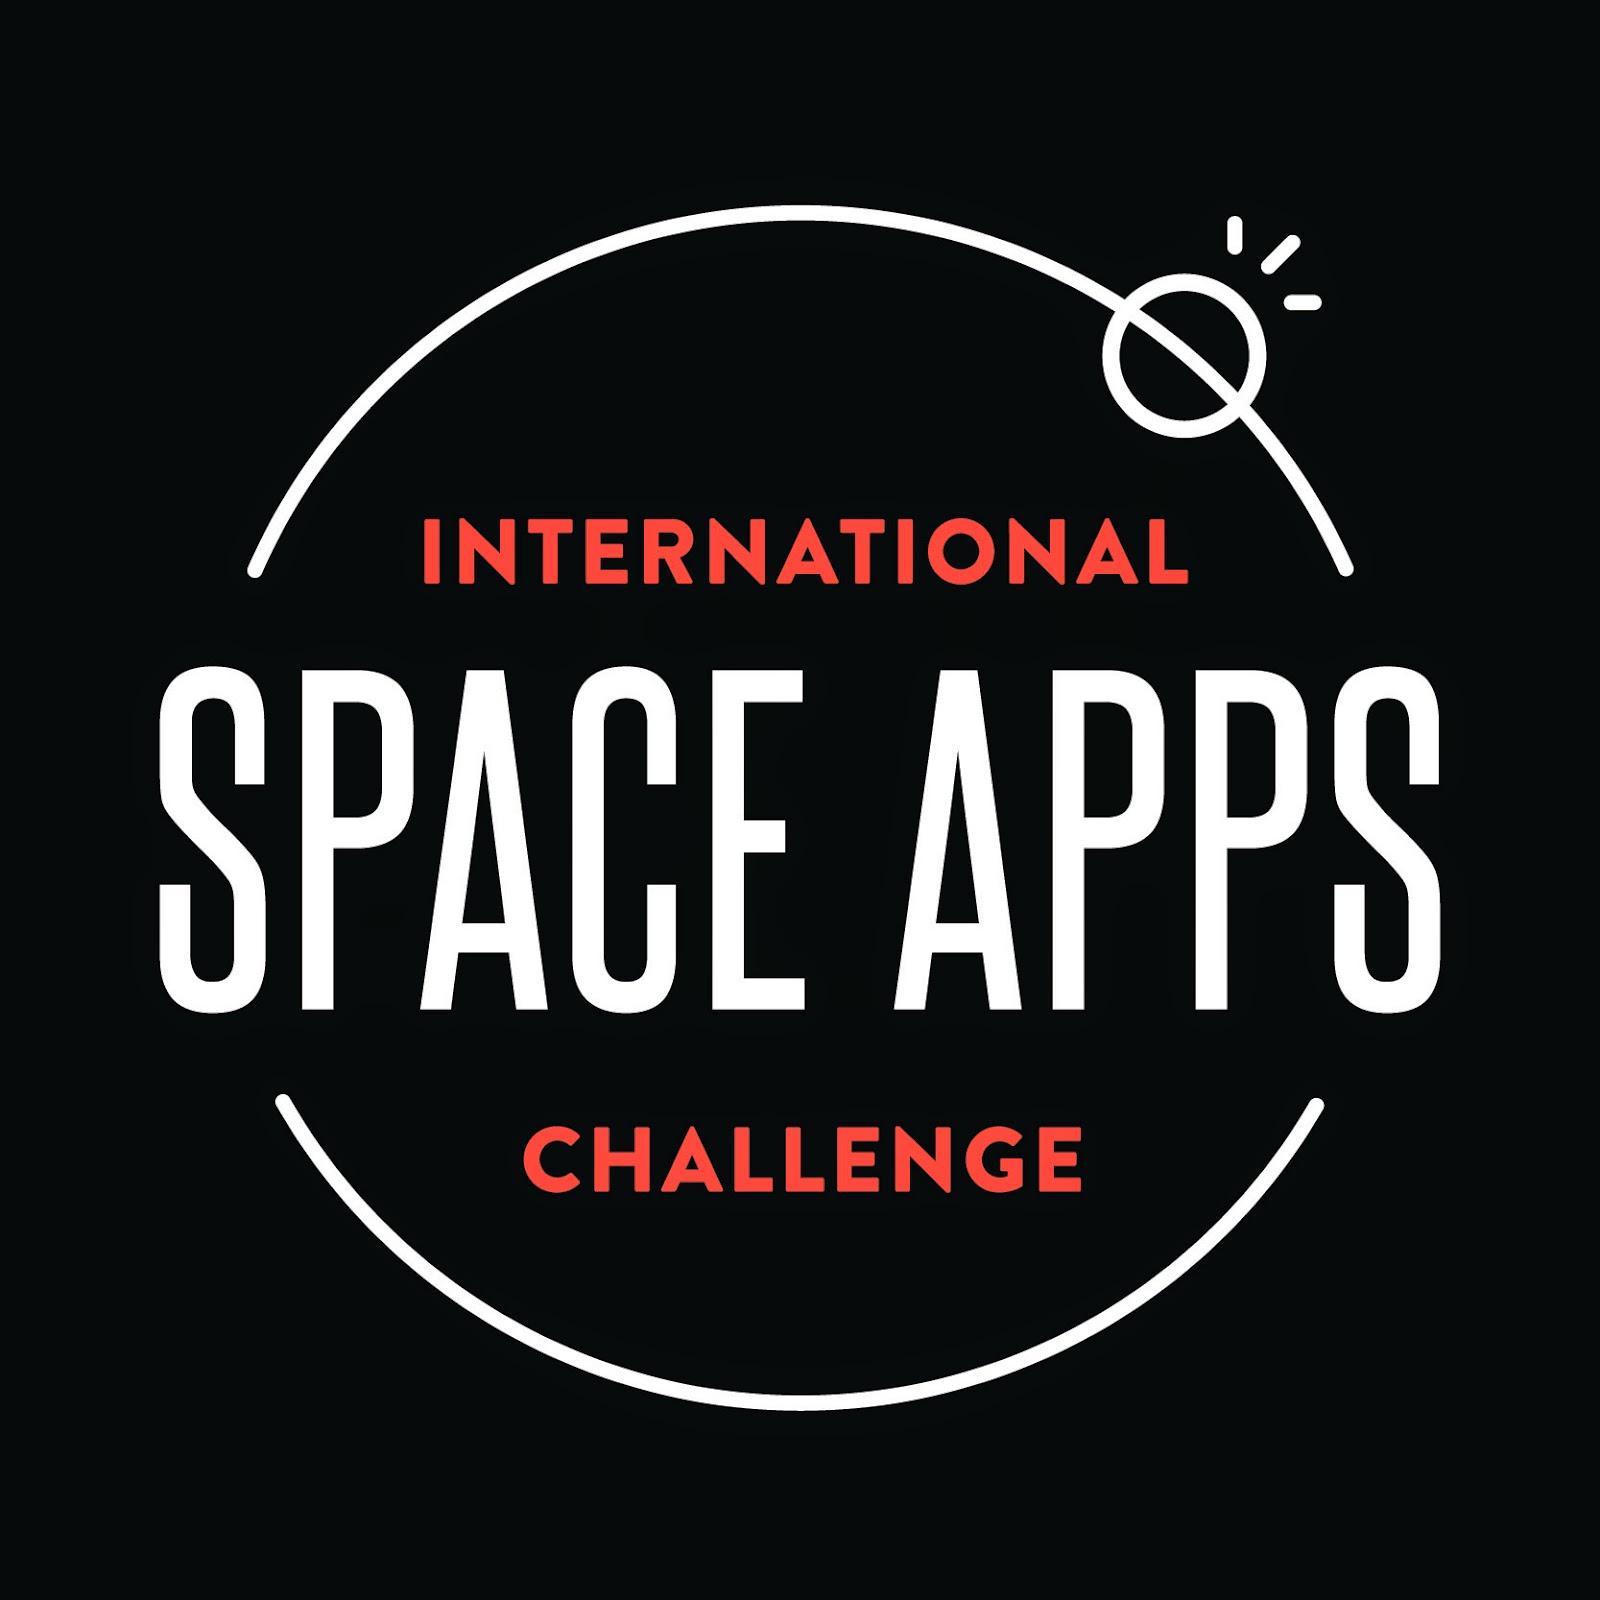 spacecraft app - photo #36